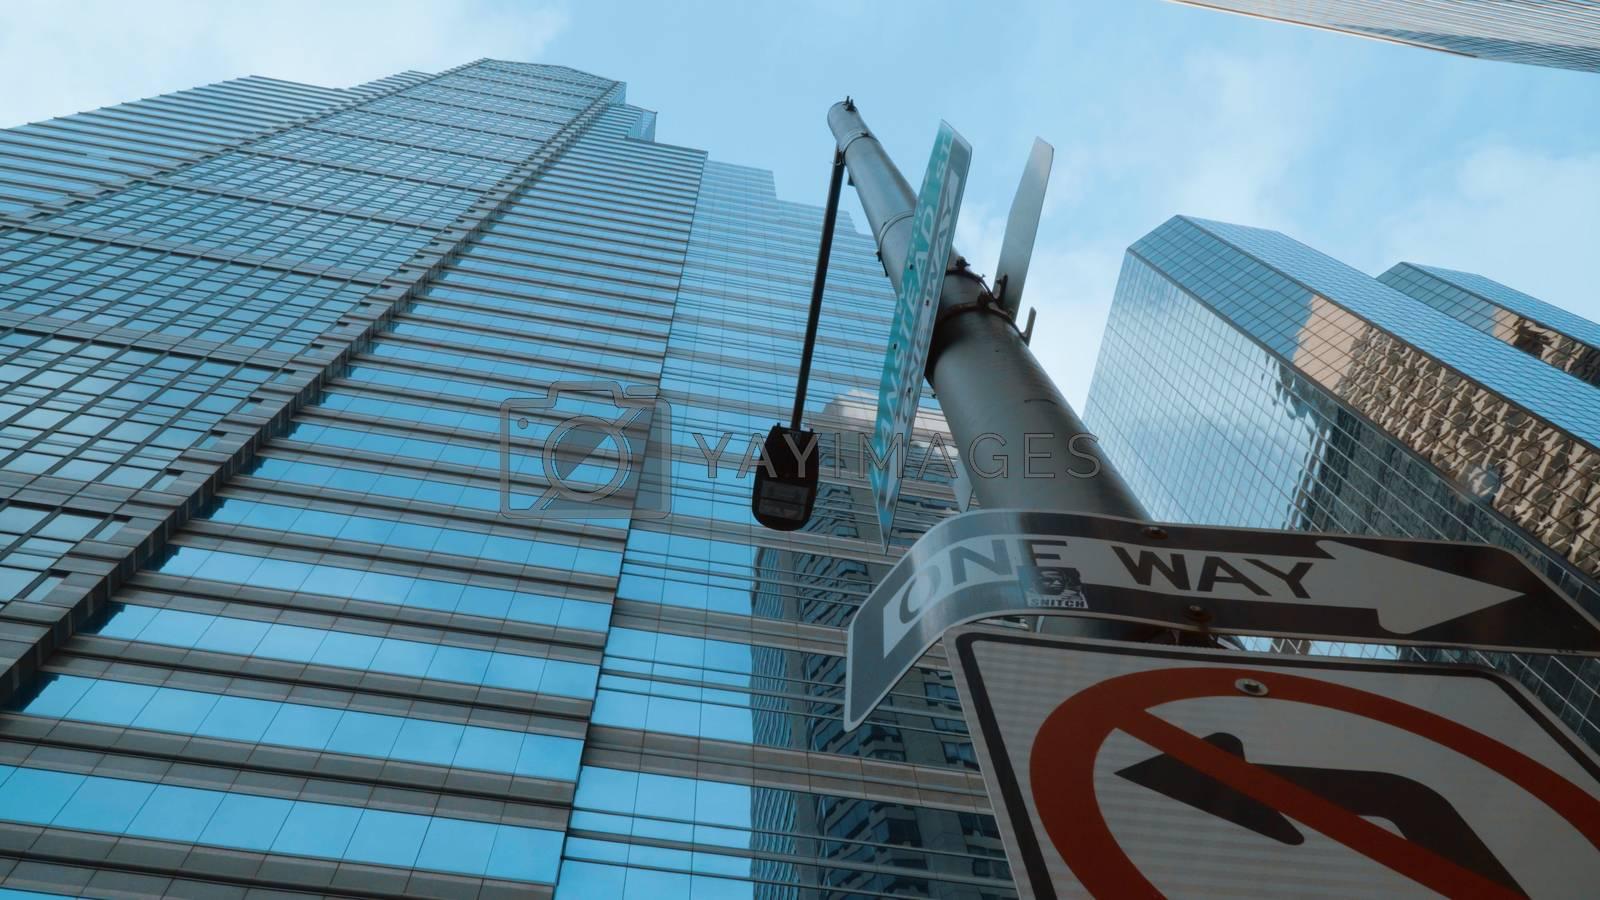 The Skycrapers of Philadelphia